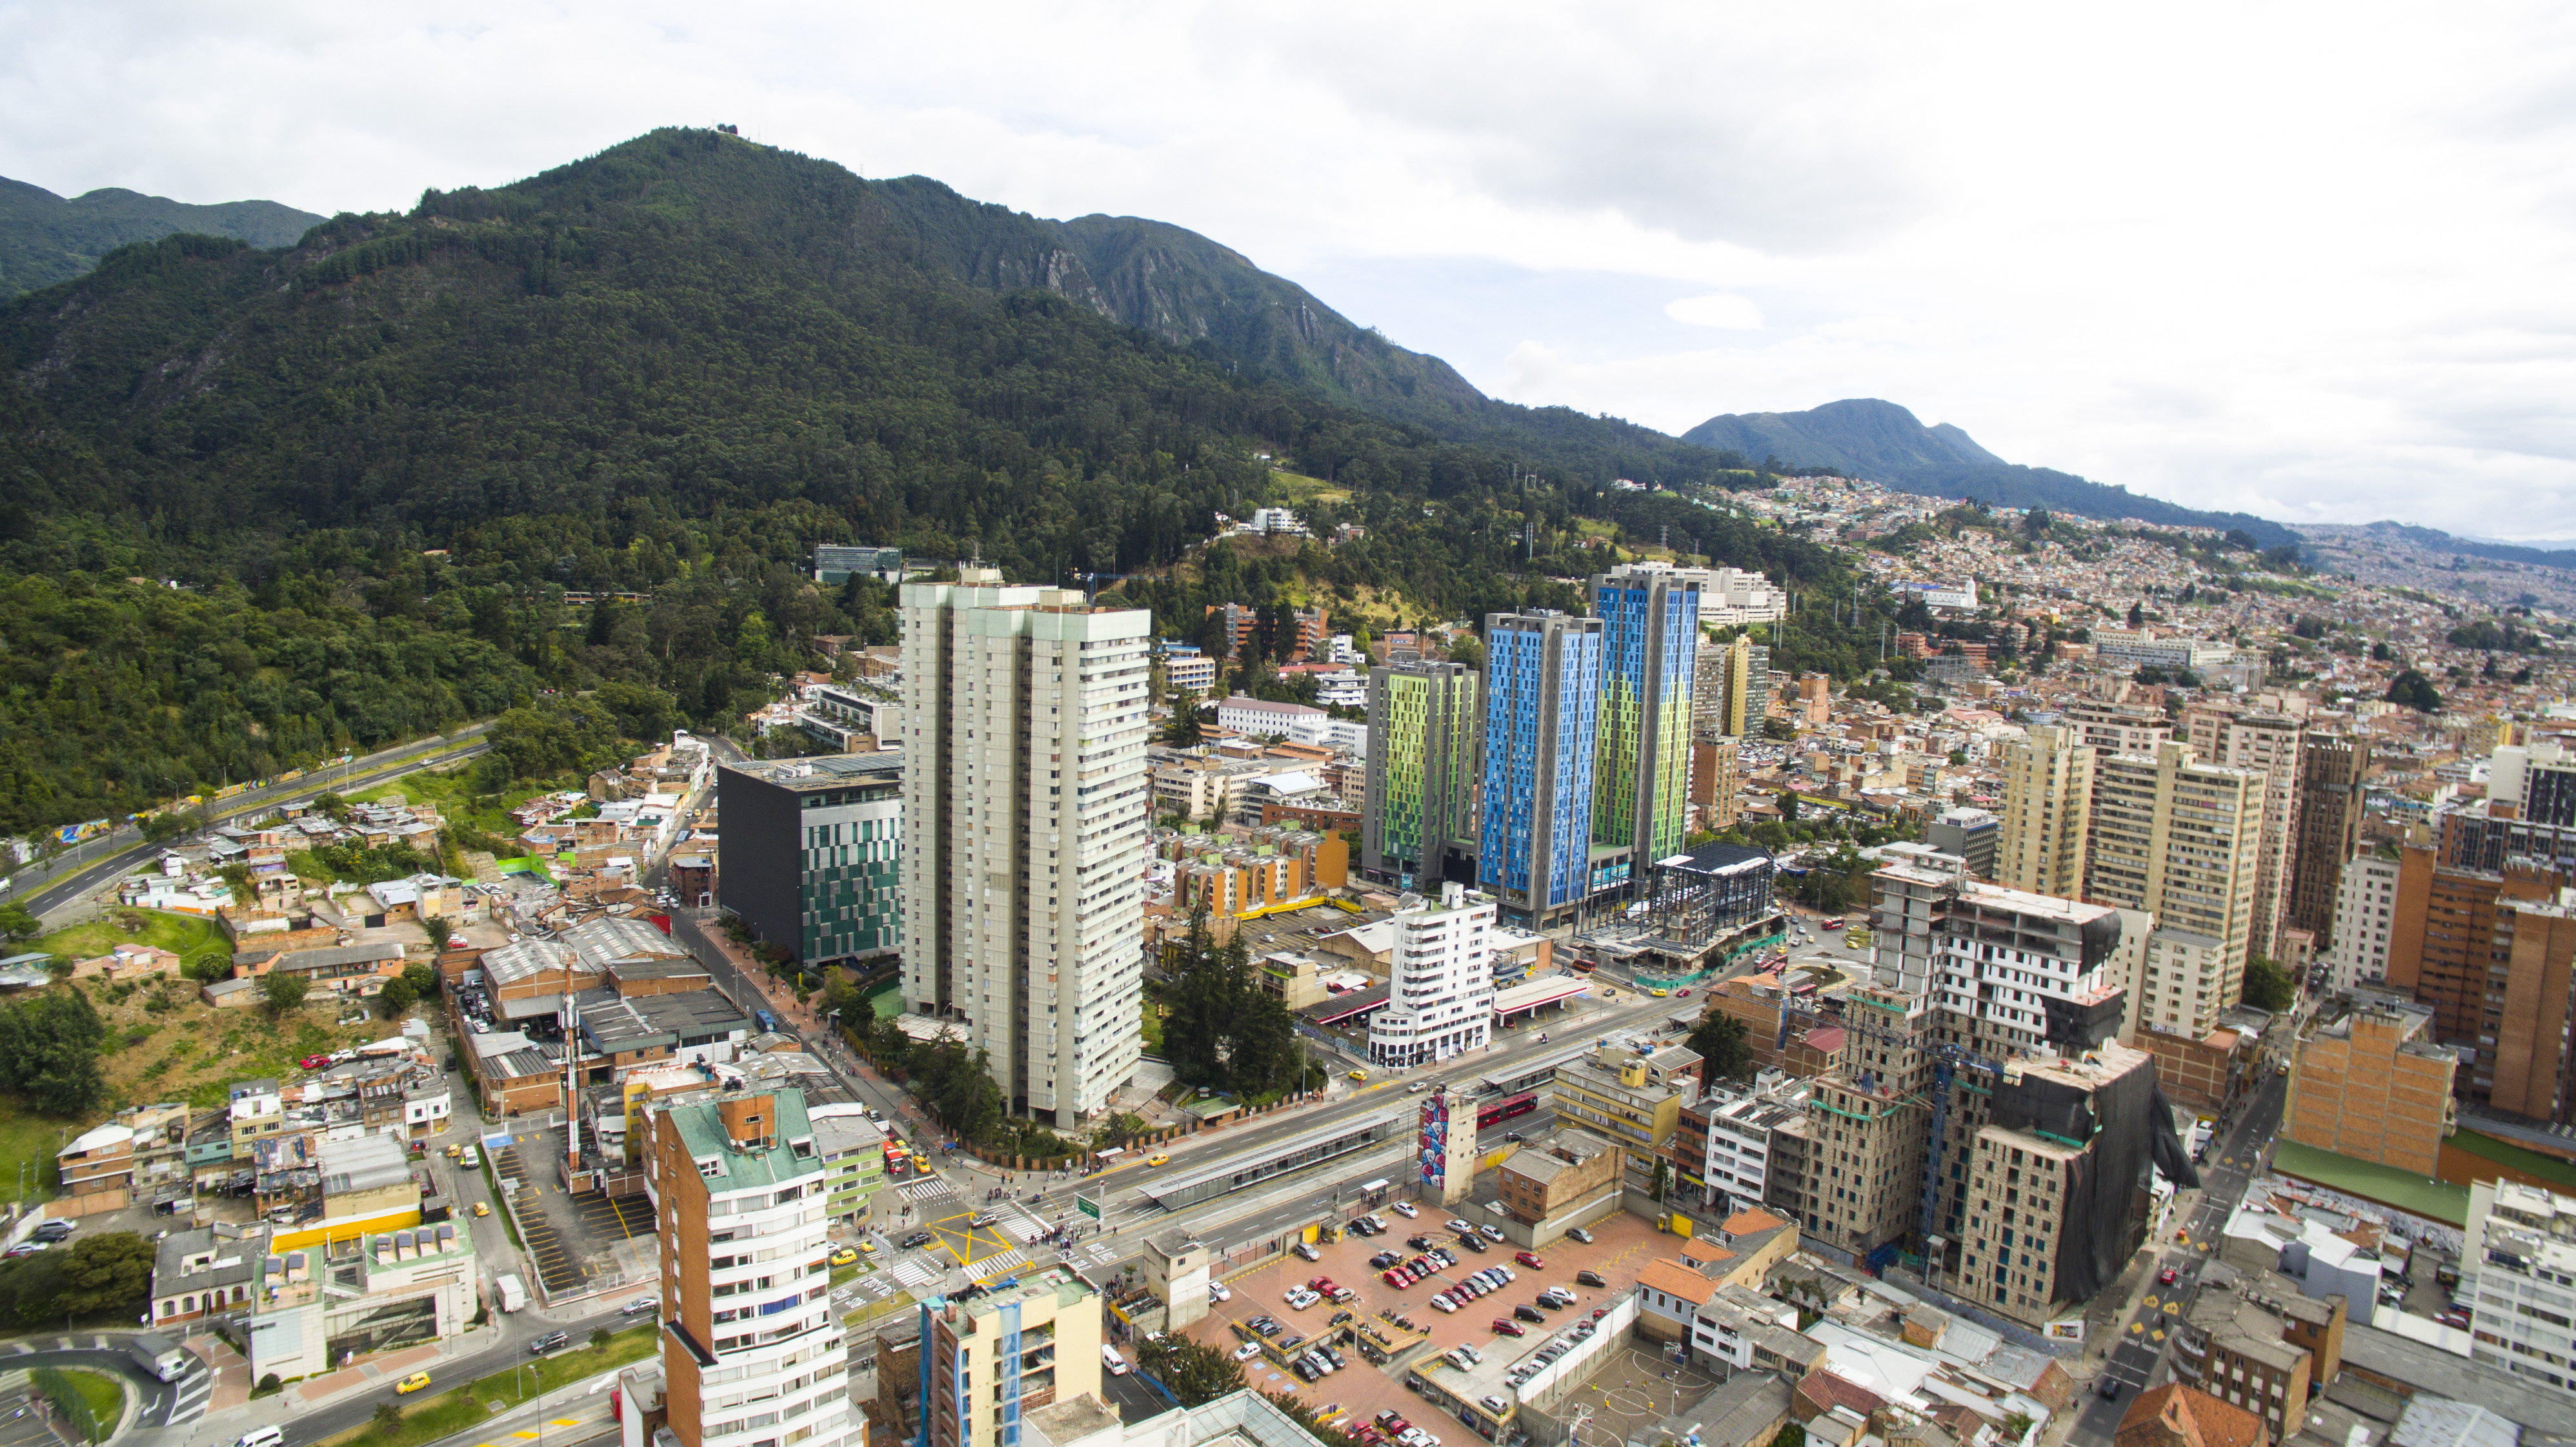 Ciudadela Universitaria, Bogotá